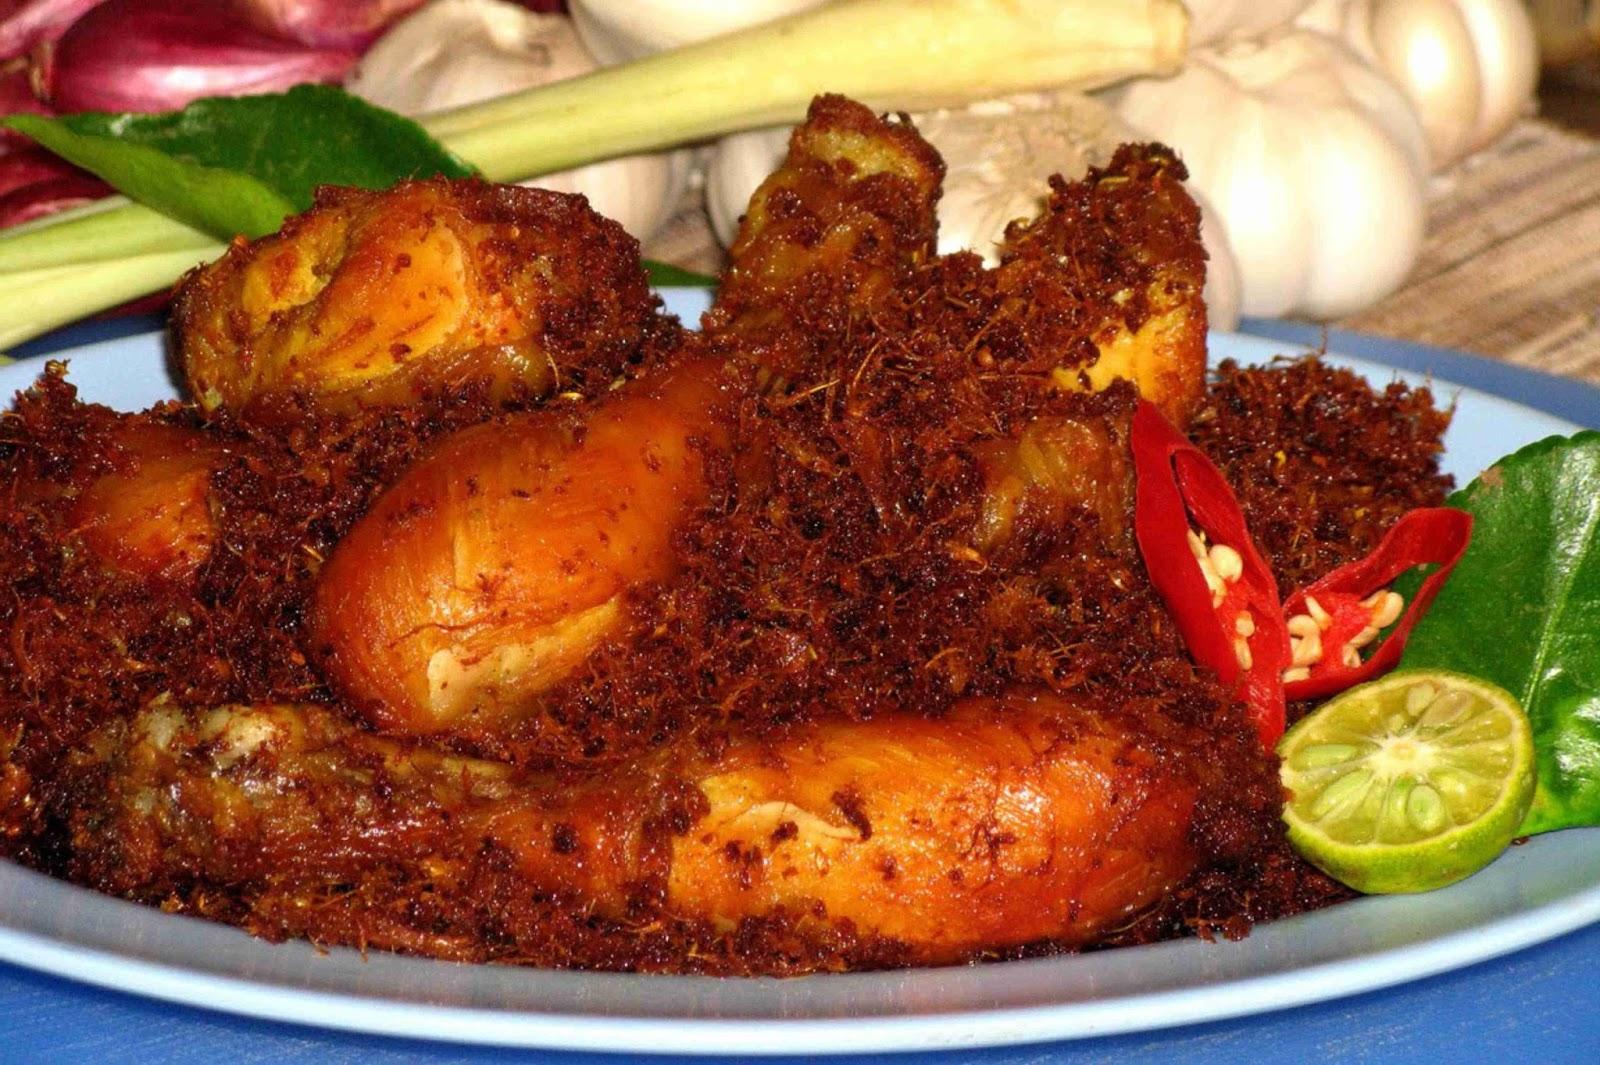 Resep Ayam Goreng Padang ~ Resep Kuliner khas Nusantara